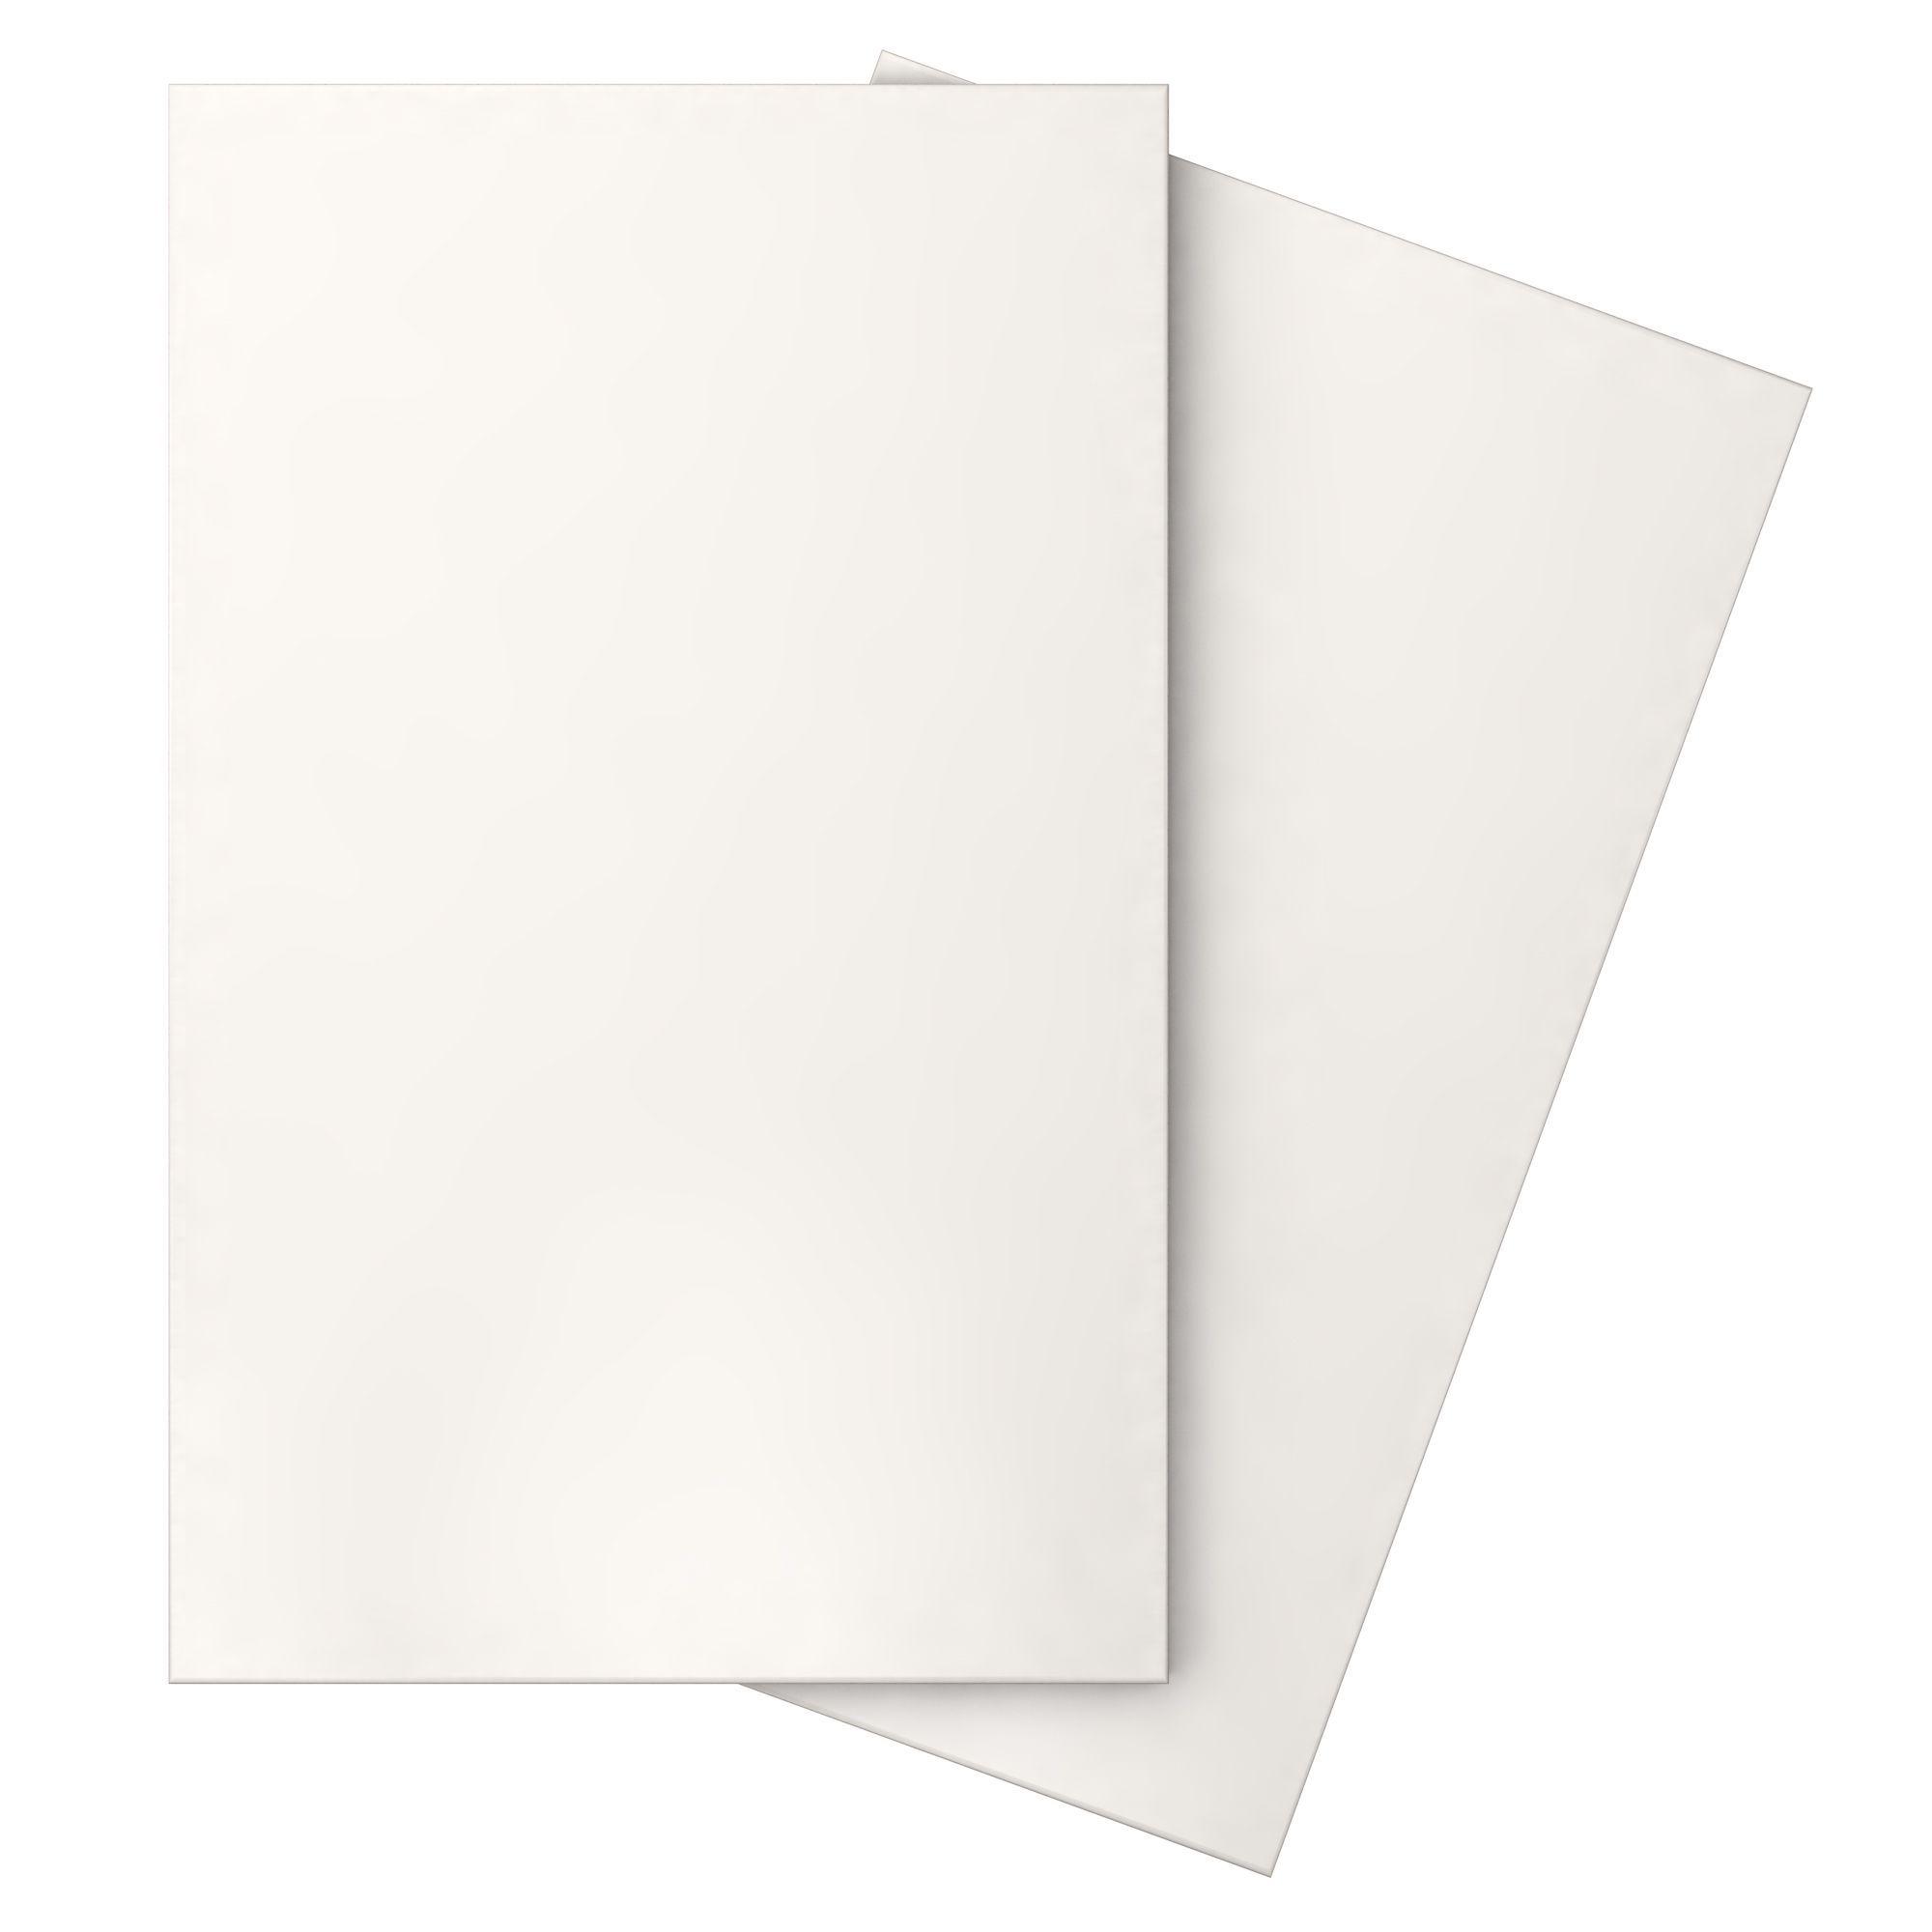 Iris white ceramic wall tile pack of 10 l400mm w250mm iris white ceramic wall tile pack of 10 l400mm w250mm departments diy at bq dailygadgetfo Choice Image